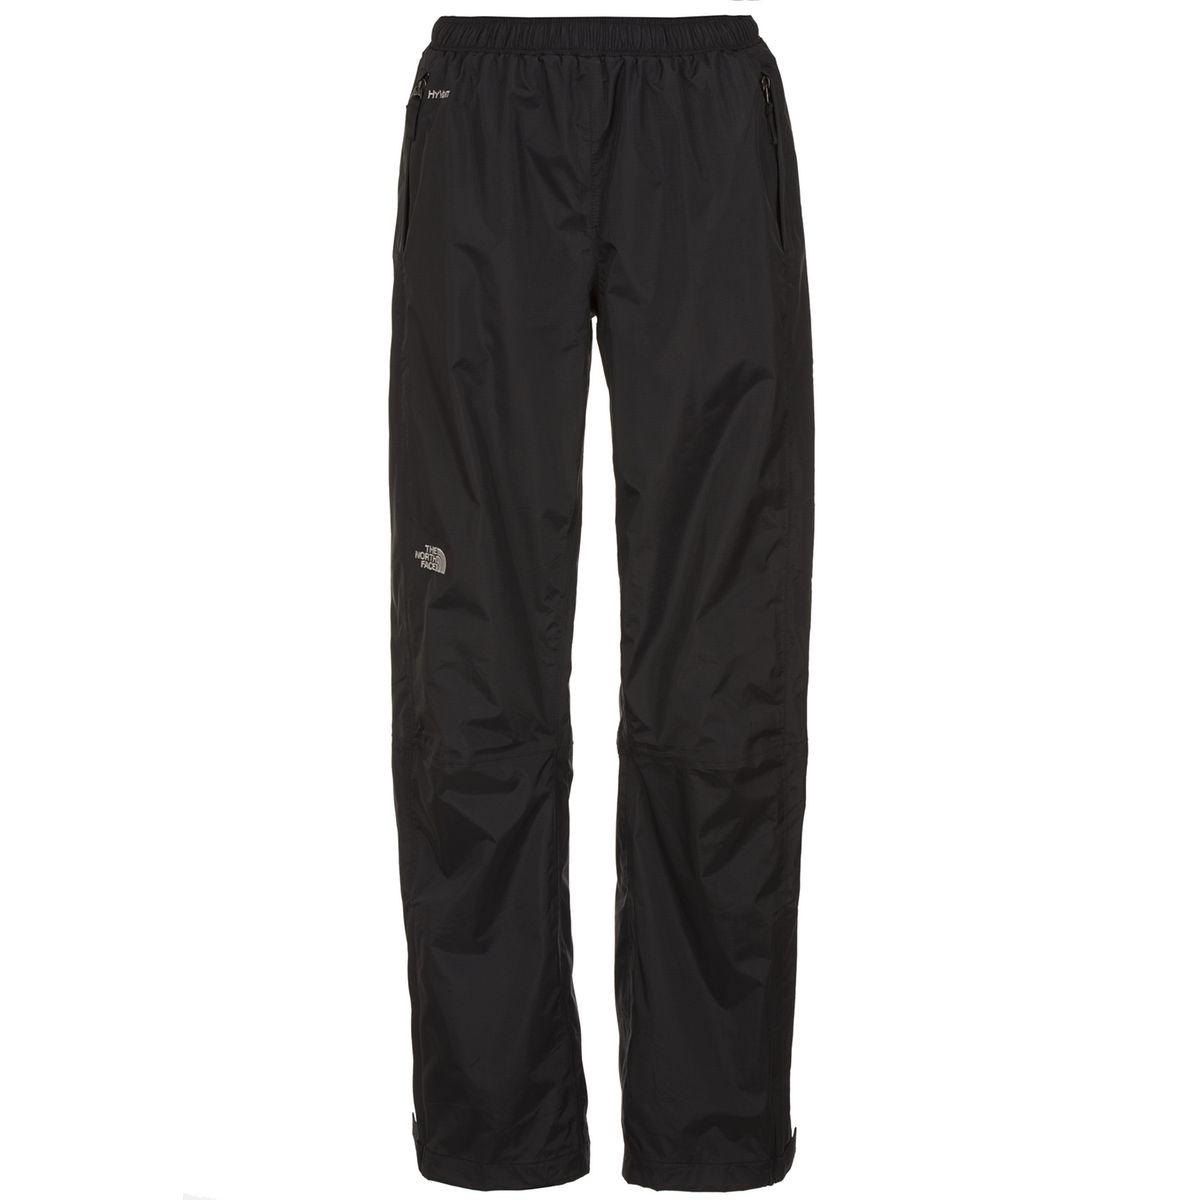 Resolve - Pantalon femme - noir